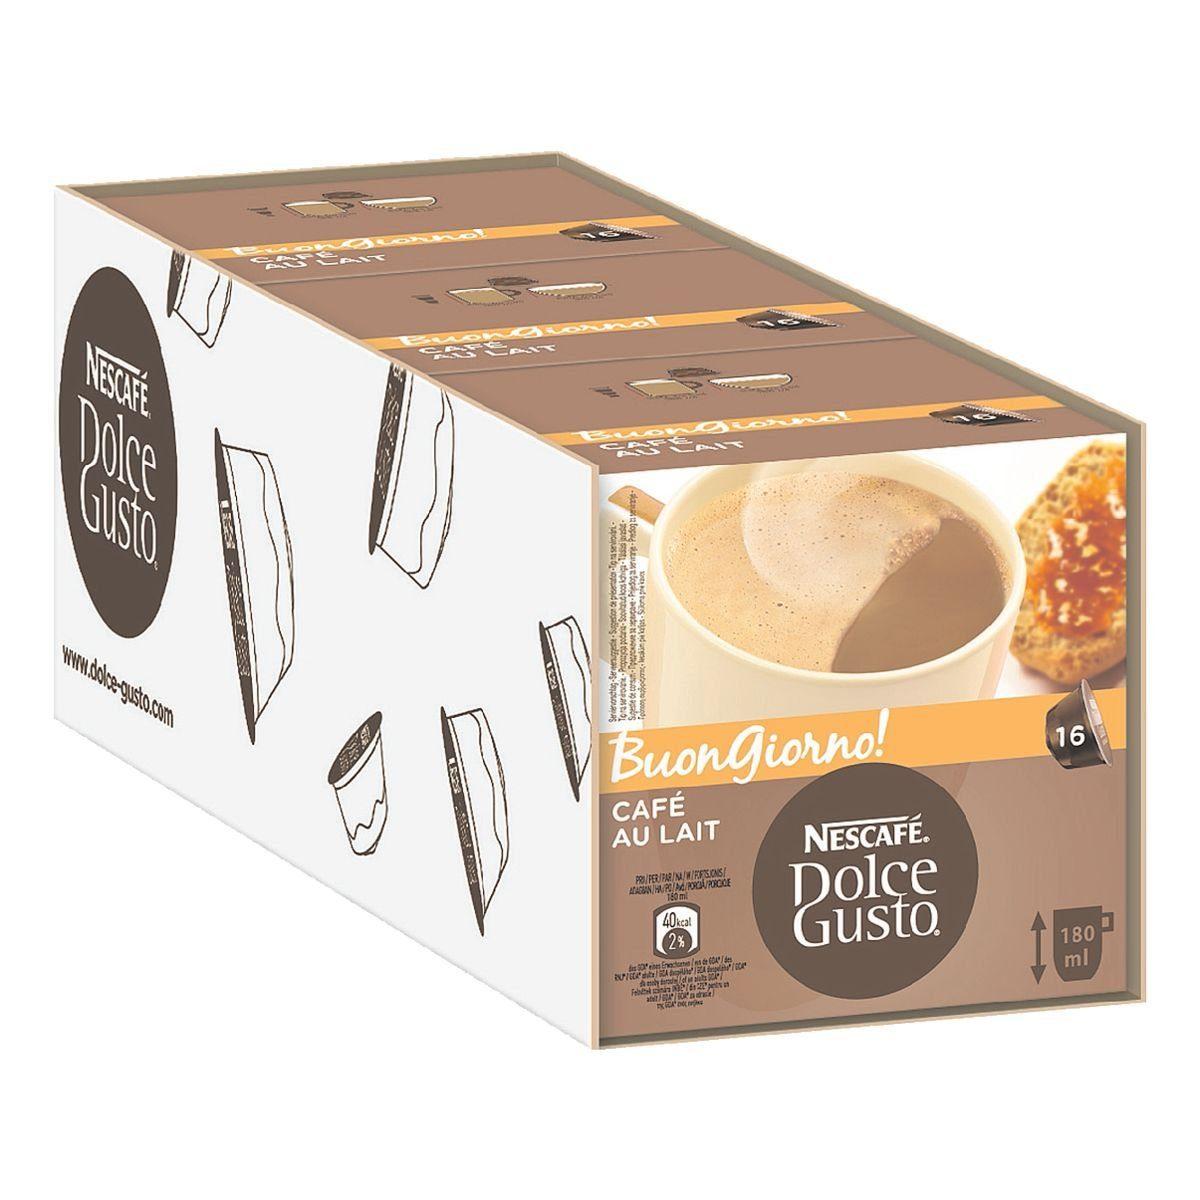 NESCAFE 1 Pack Kaffeekapseln »Dolce Gusto Café au Lait«